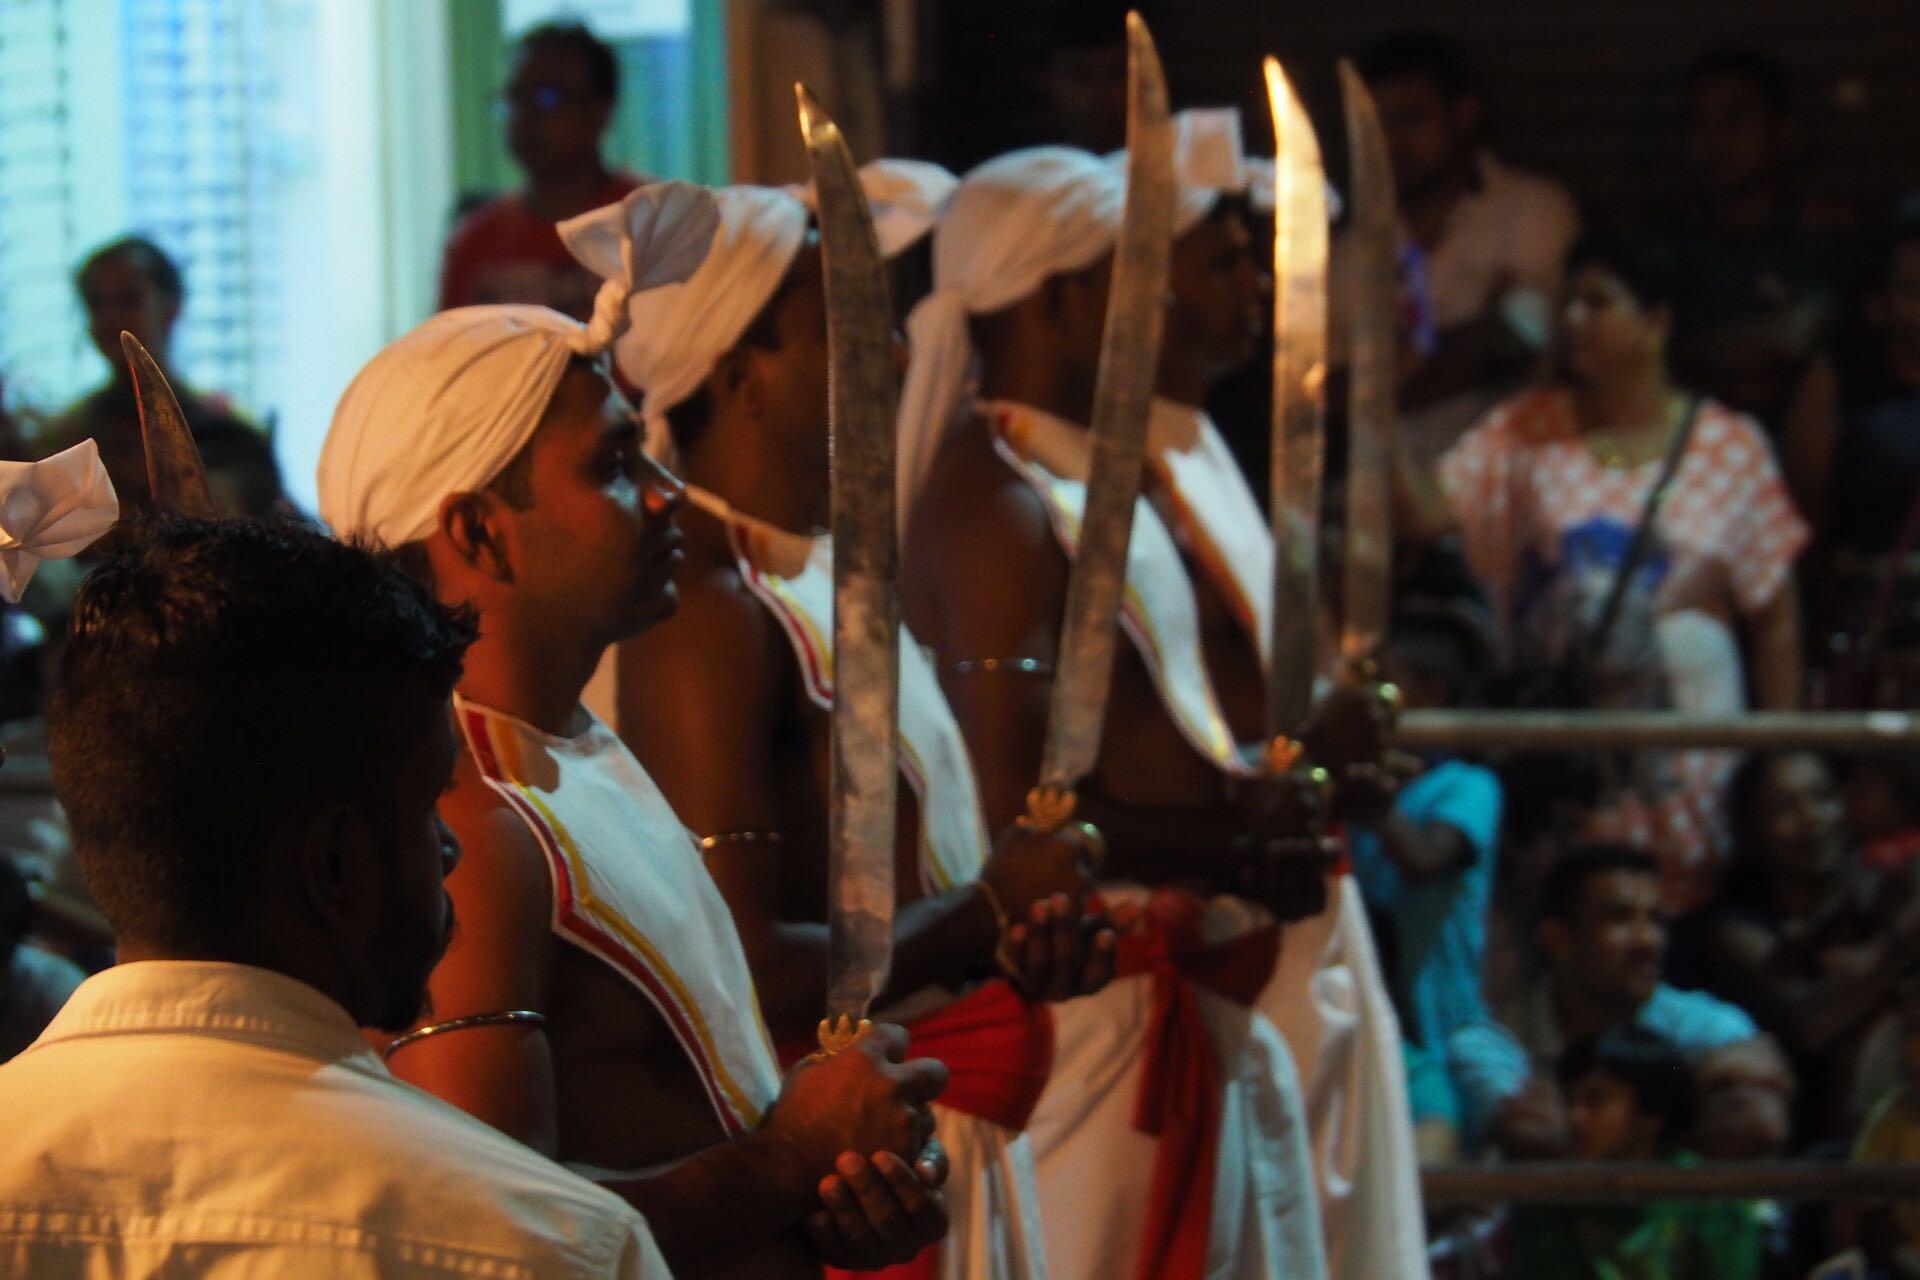 sri-lanka-kandy-perahera-performers-holiday-review-feedback-invite-to-paradise-quentin-kate-hulm.jpg